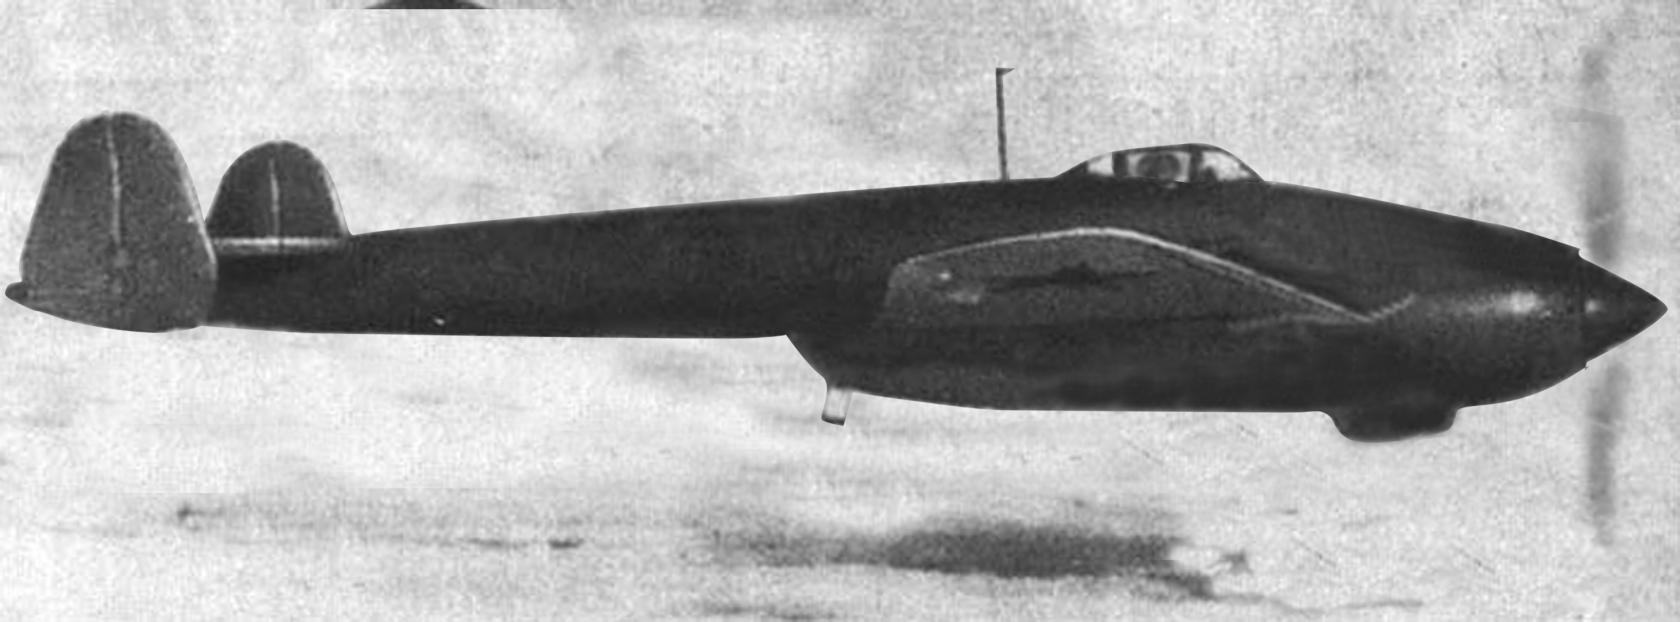 wowp-ussr-planes-history.jpg